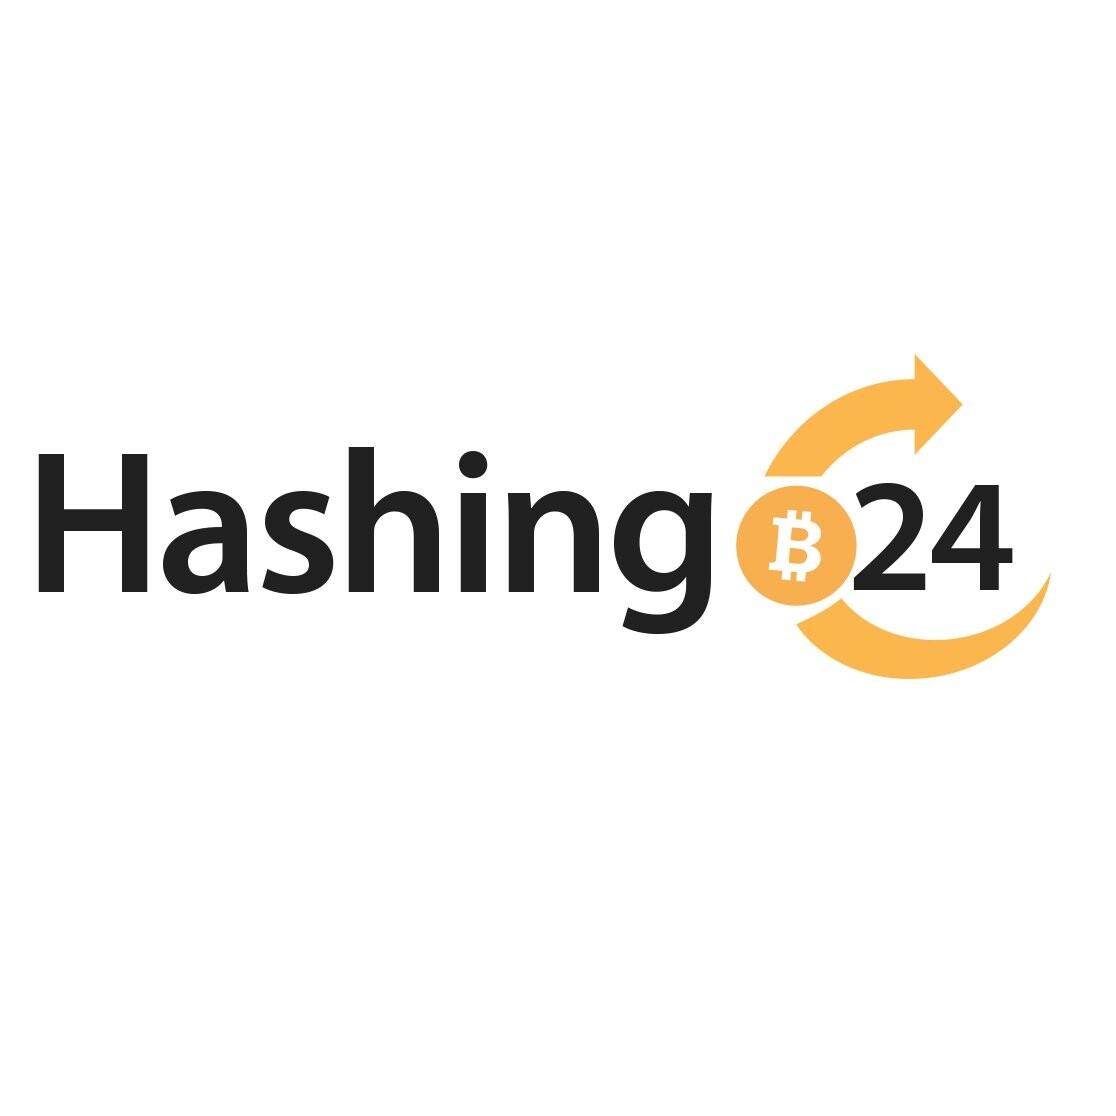 Hashing24